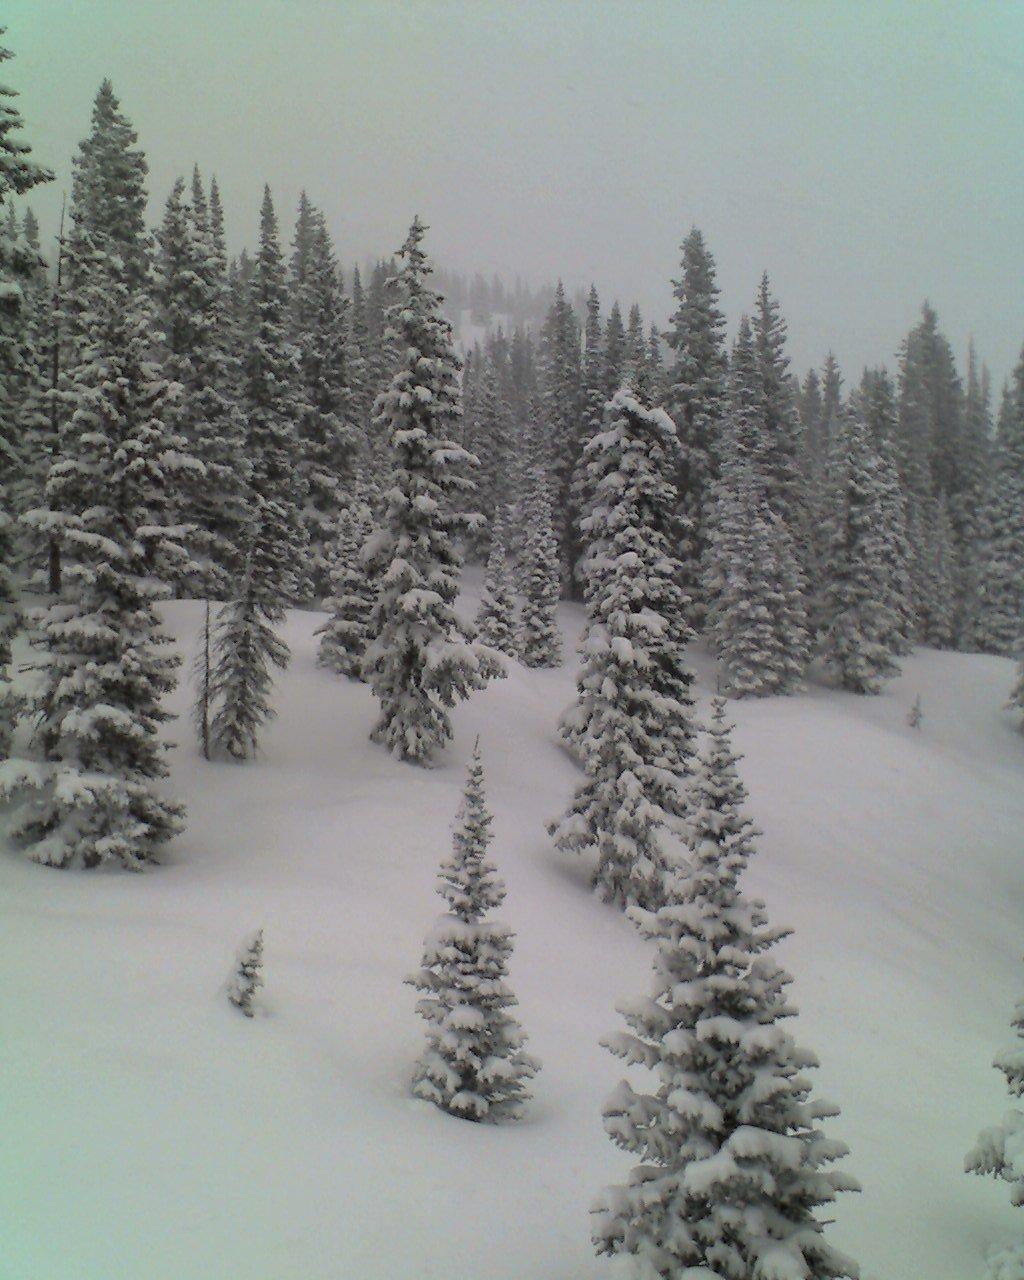 Skiing - 12 of 18